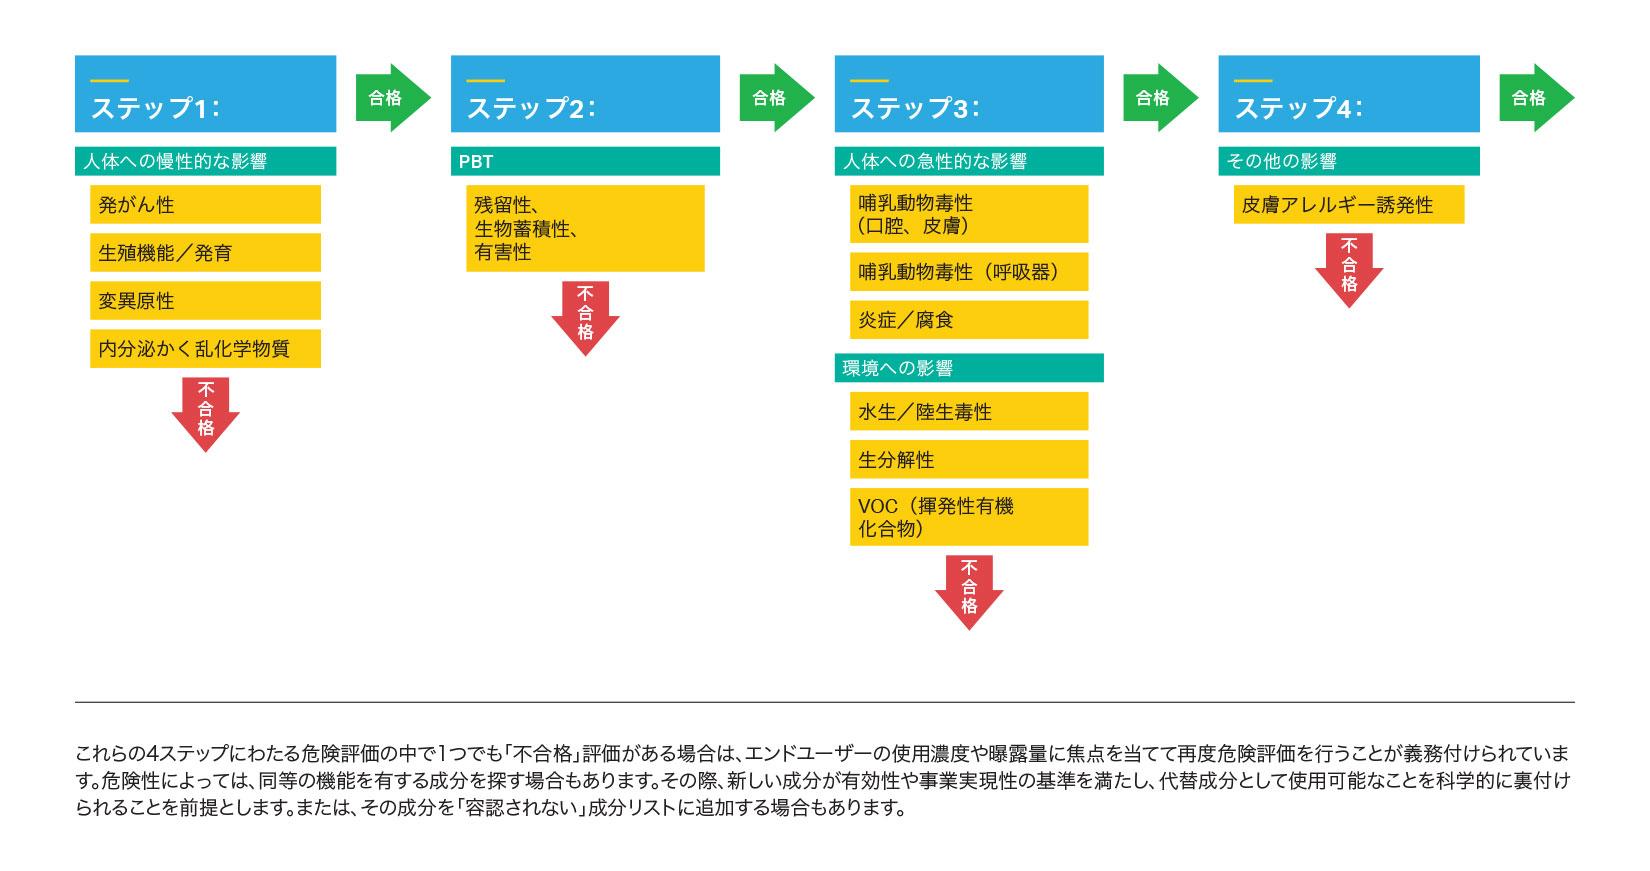 SCジョンソン社が実施する4ステップの製品成分ハザード評価